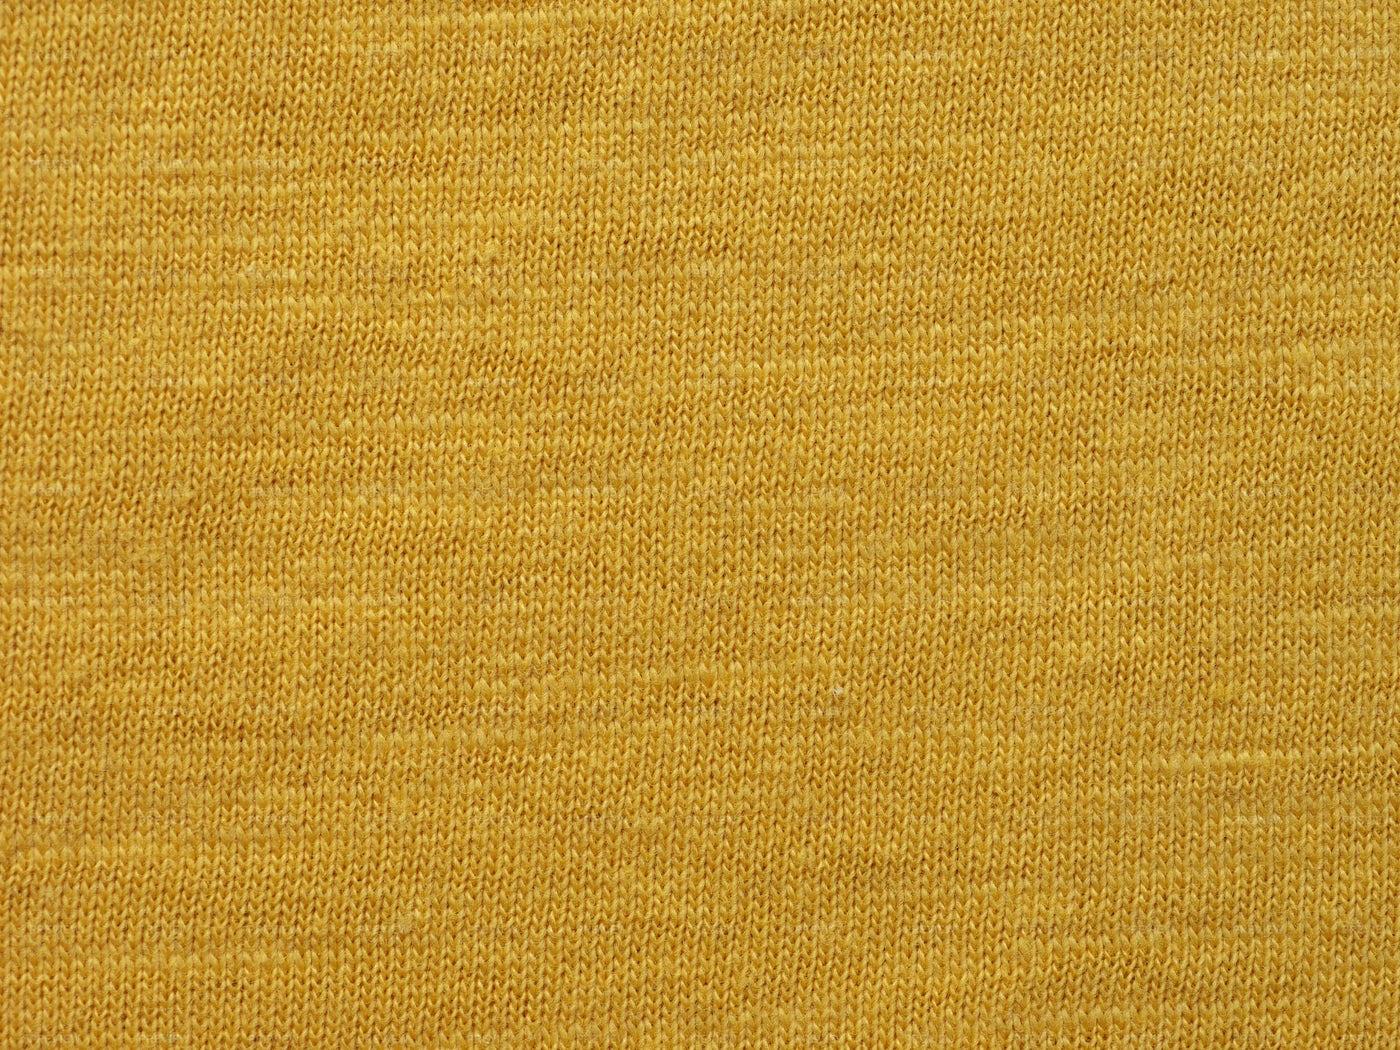 Yellow Fabric Background: Stock Photos